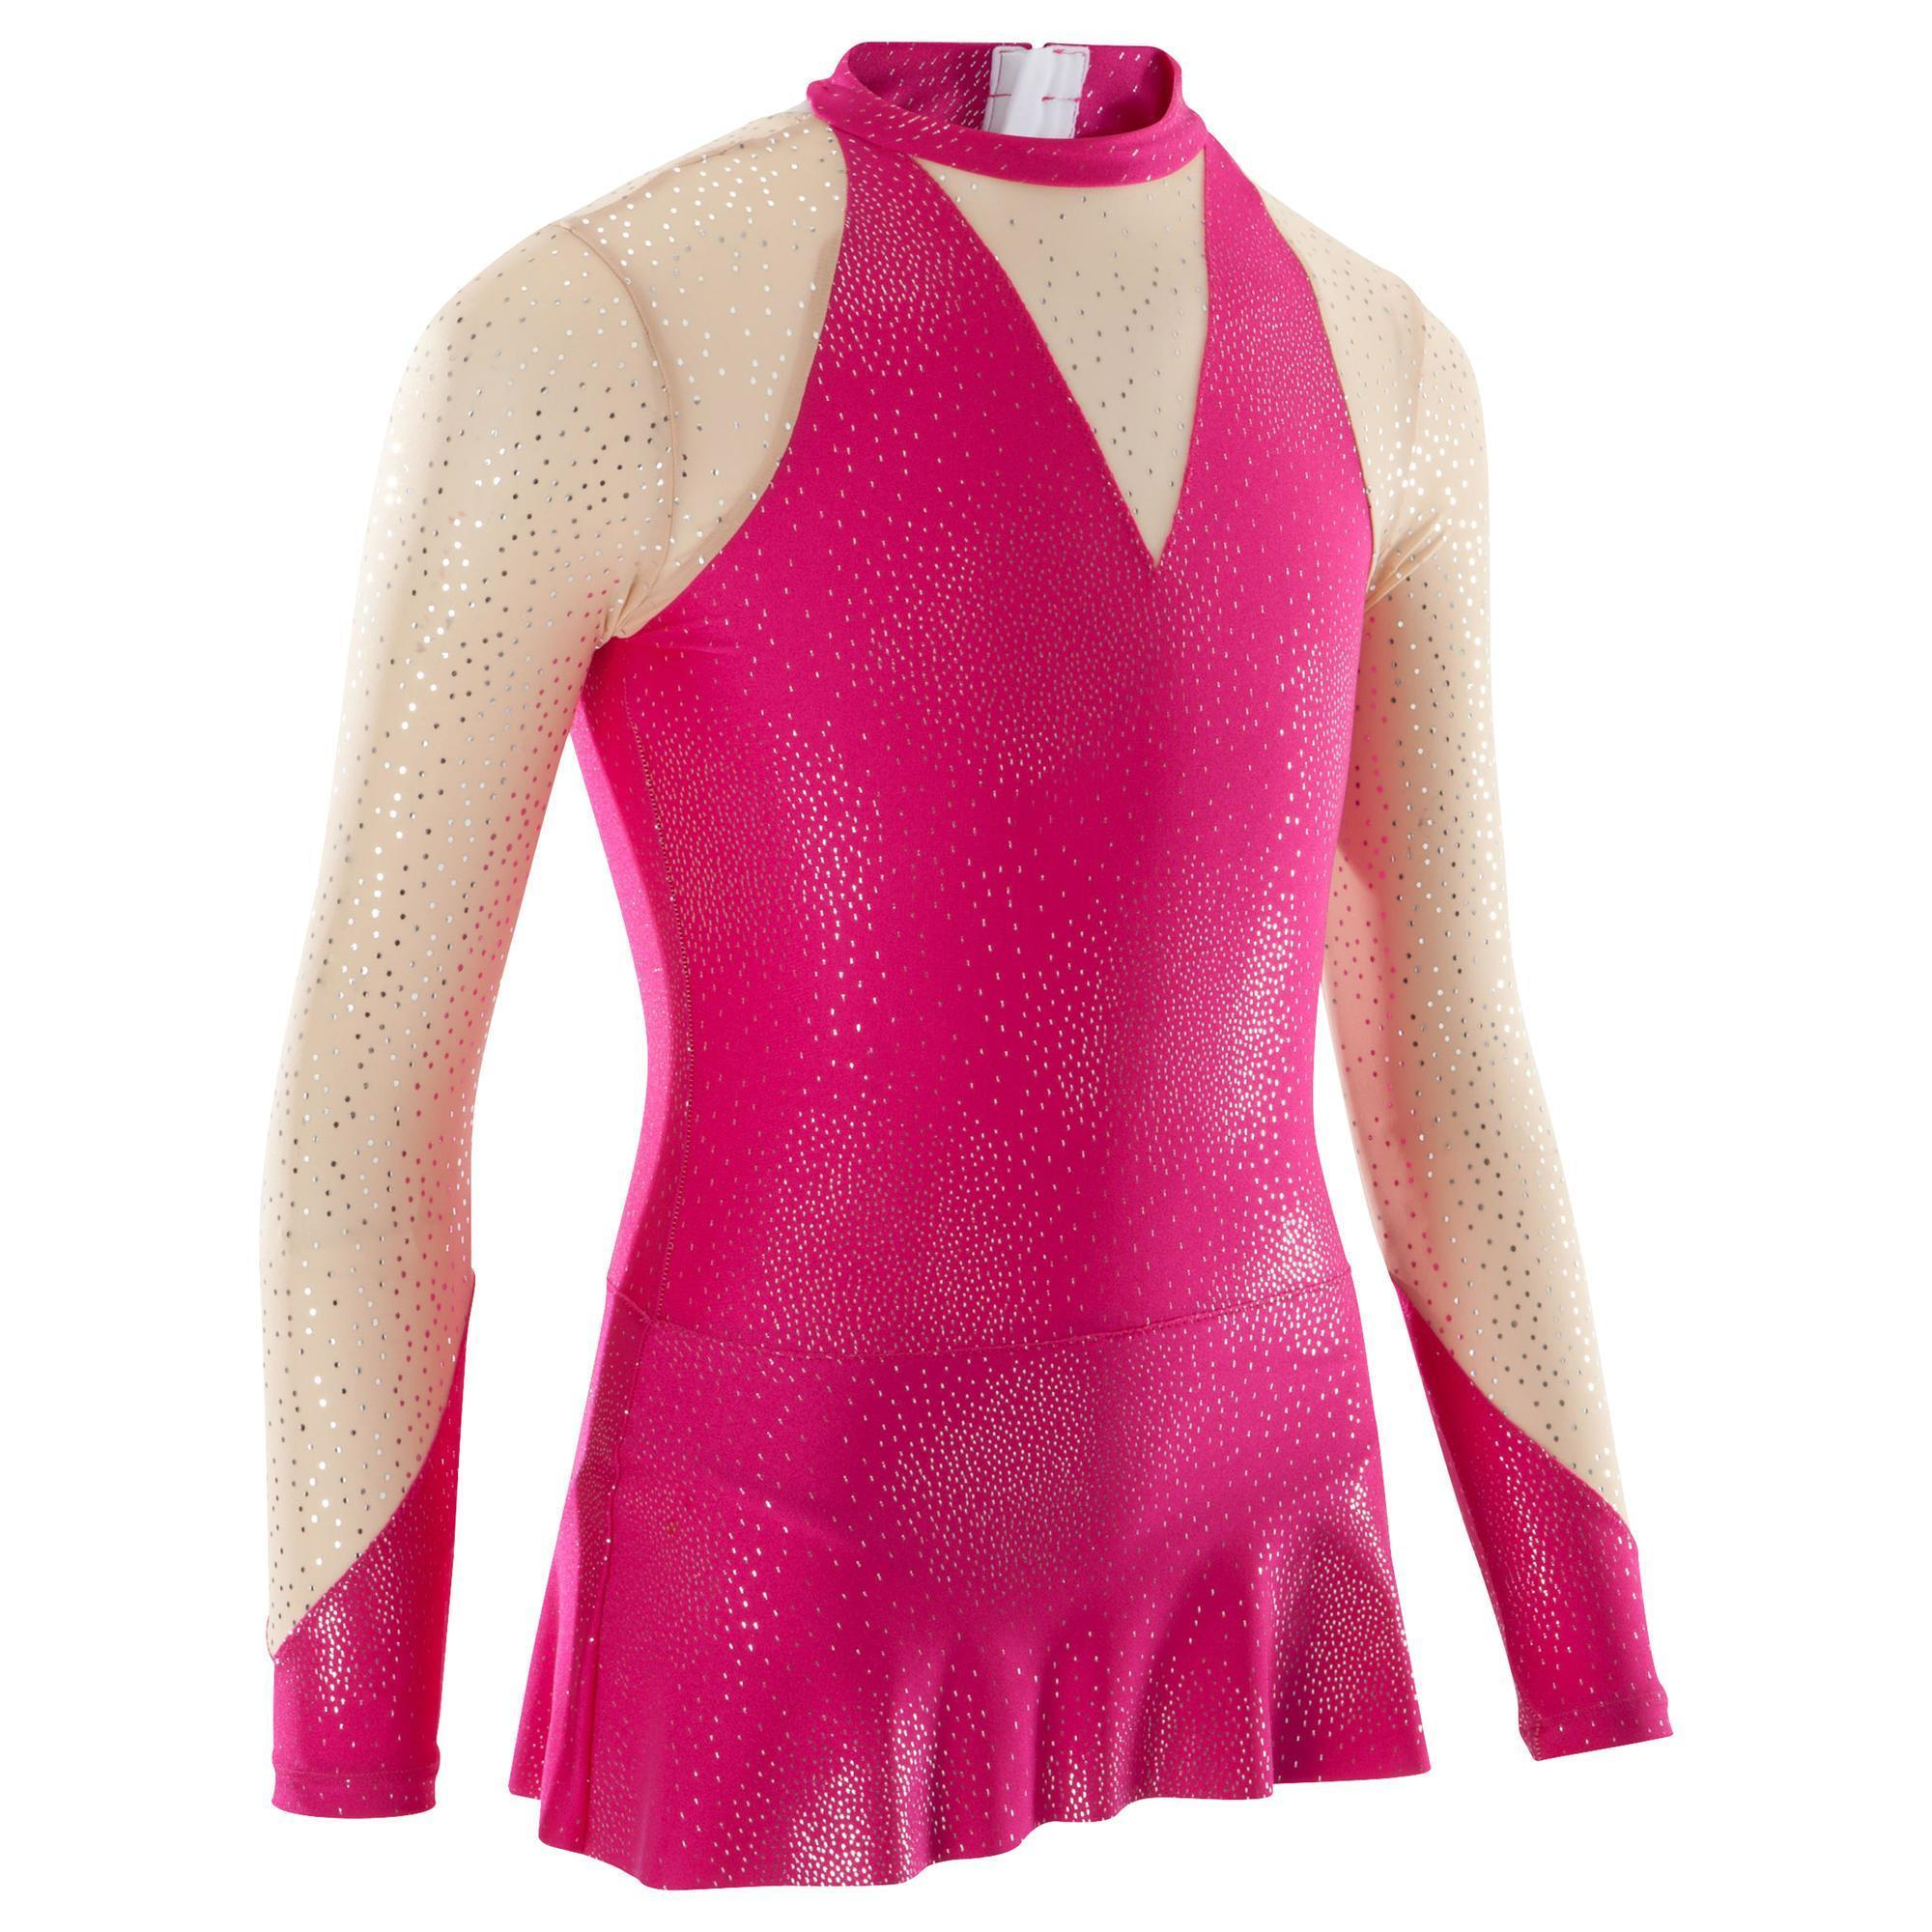 Maillot de manga larga gimnasia rítmica (GR) rosa | Domyos